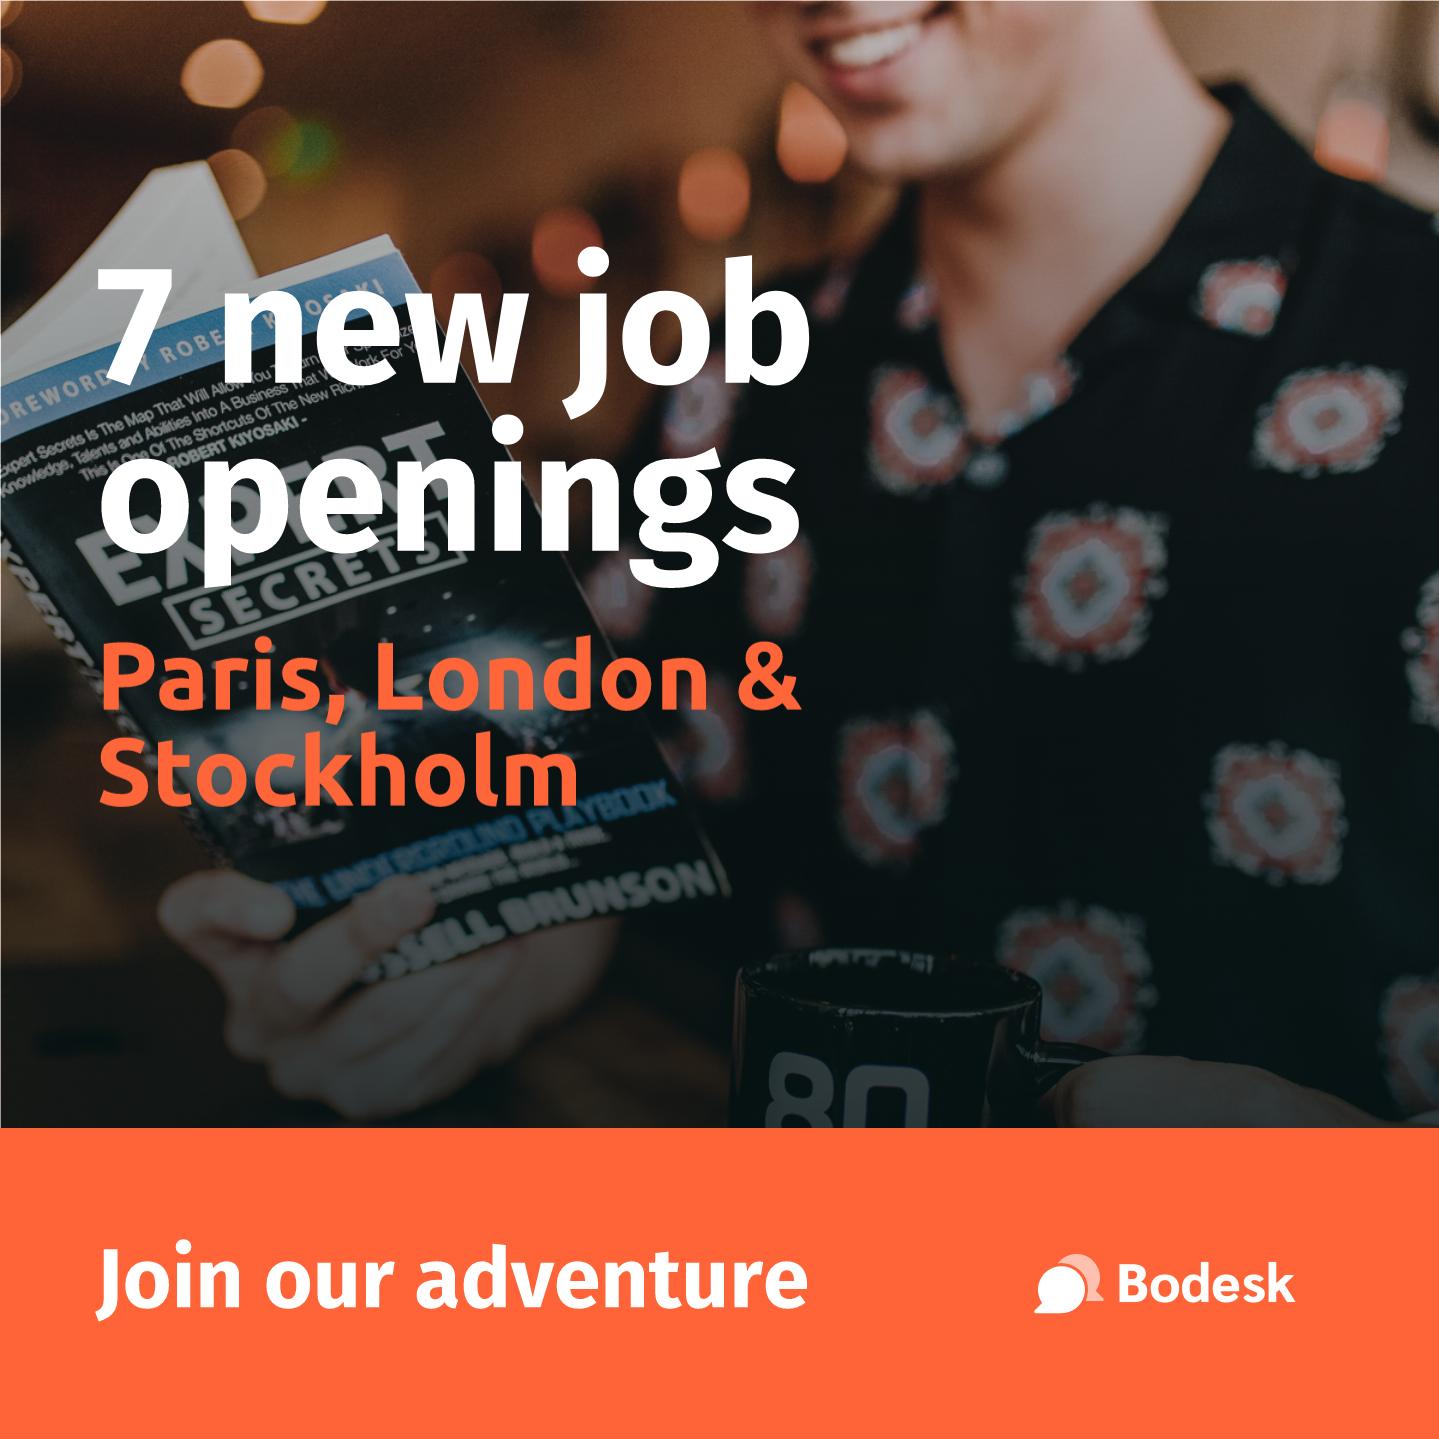 Template Post - Job openings